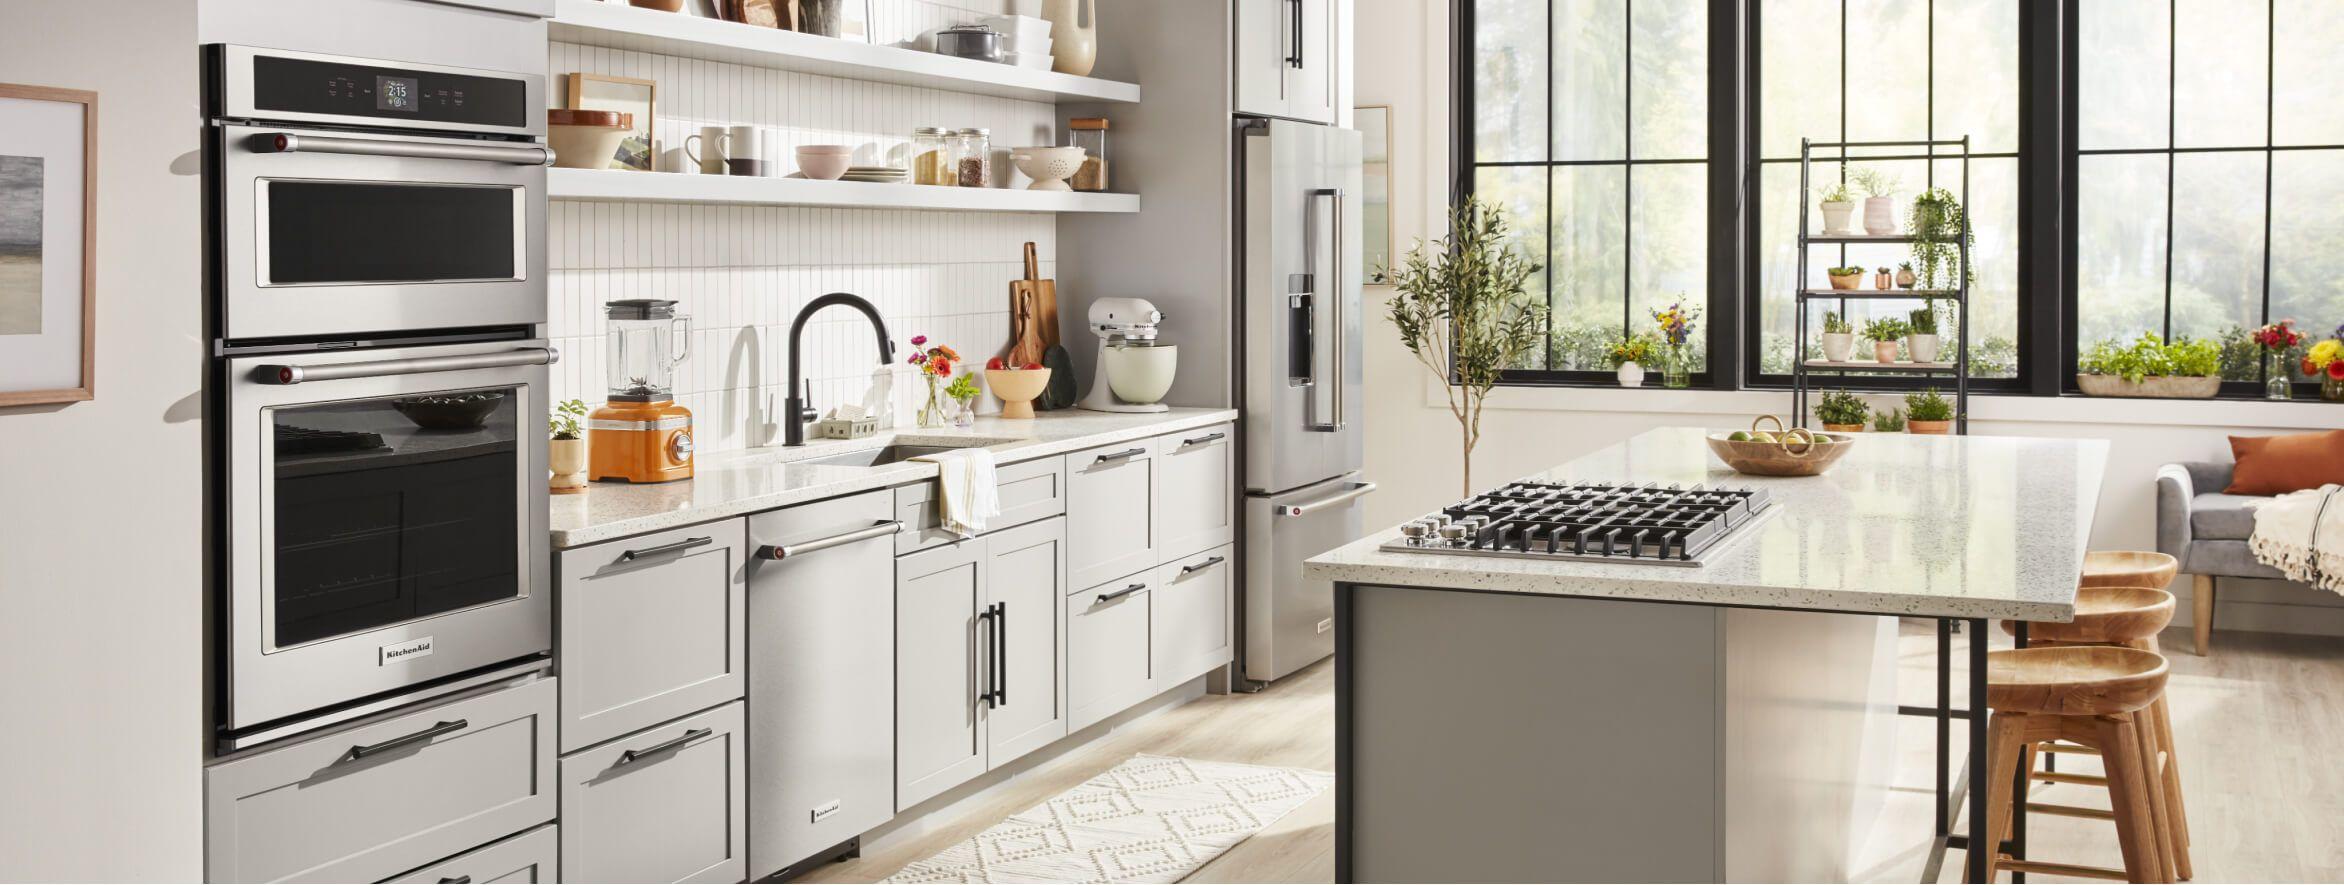 White kitchen with large island and  KitchenAid® appliances.